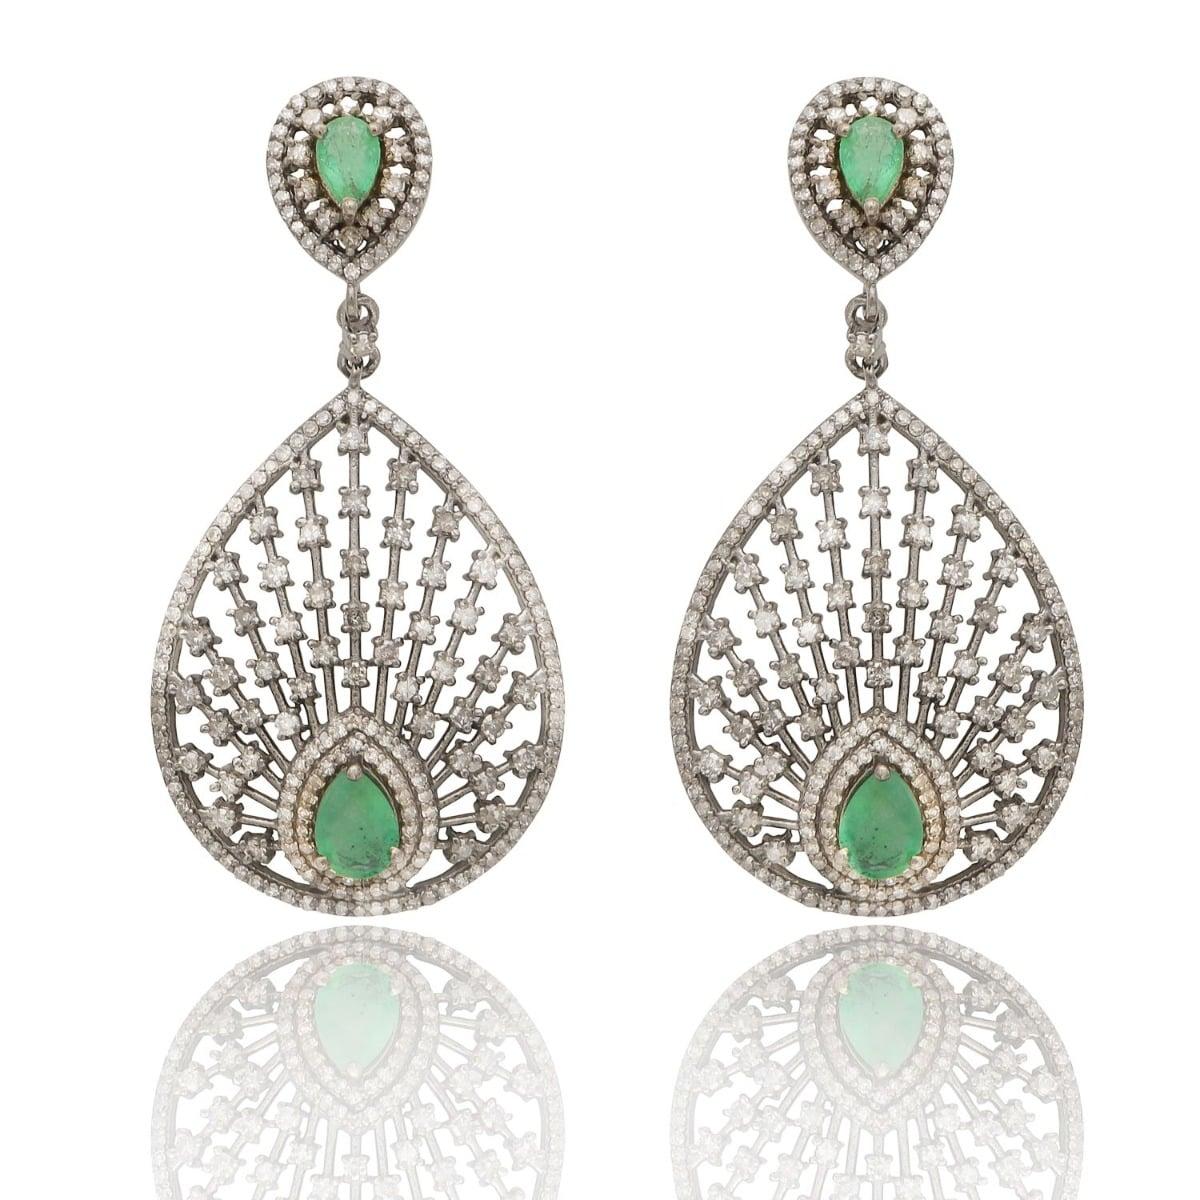 Rambagh Peacock Fan Emerald and Diamond Bridal Earrings